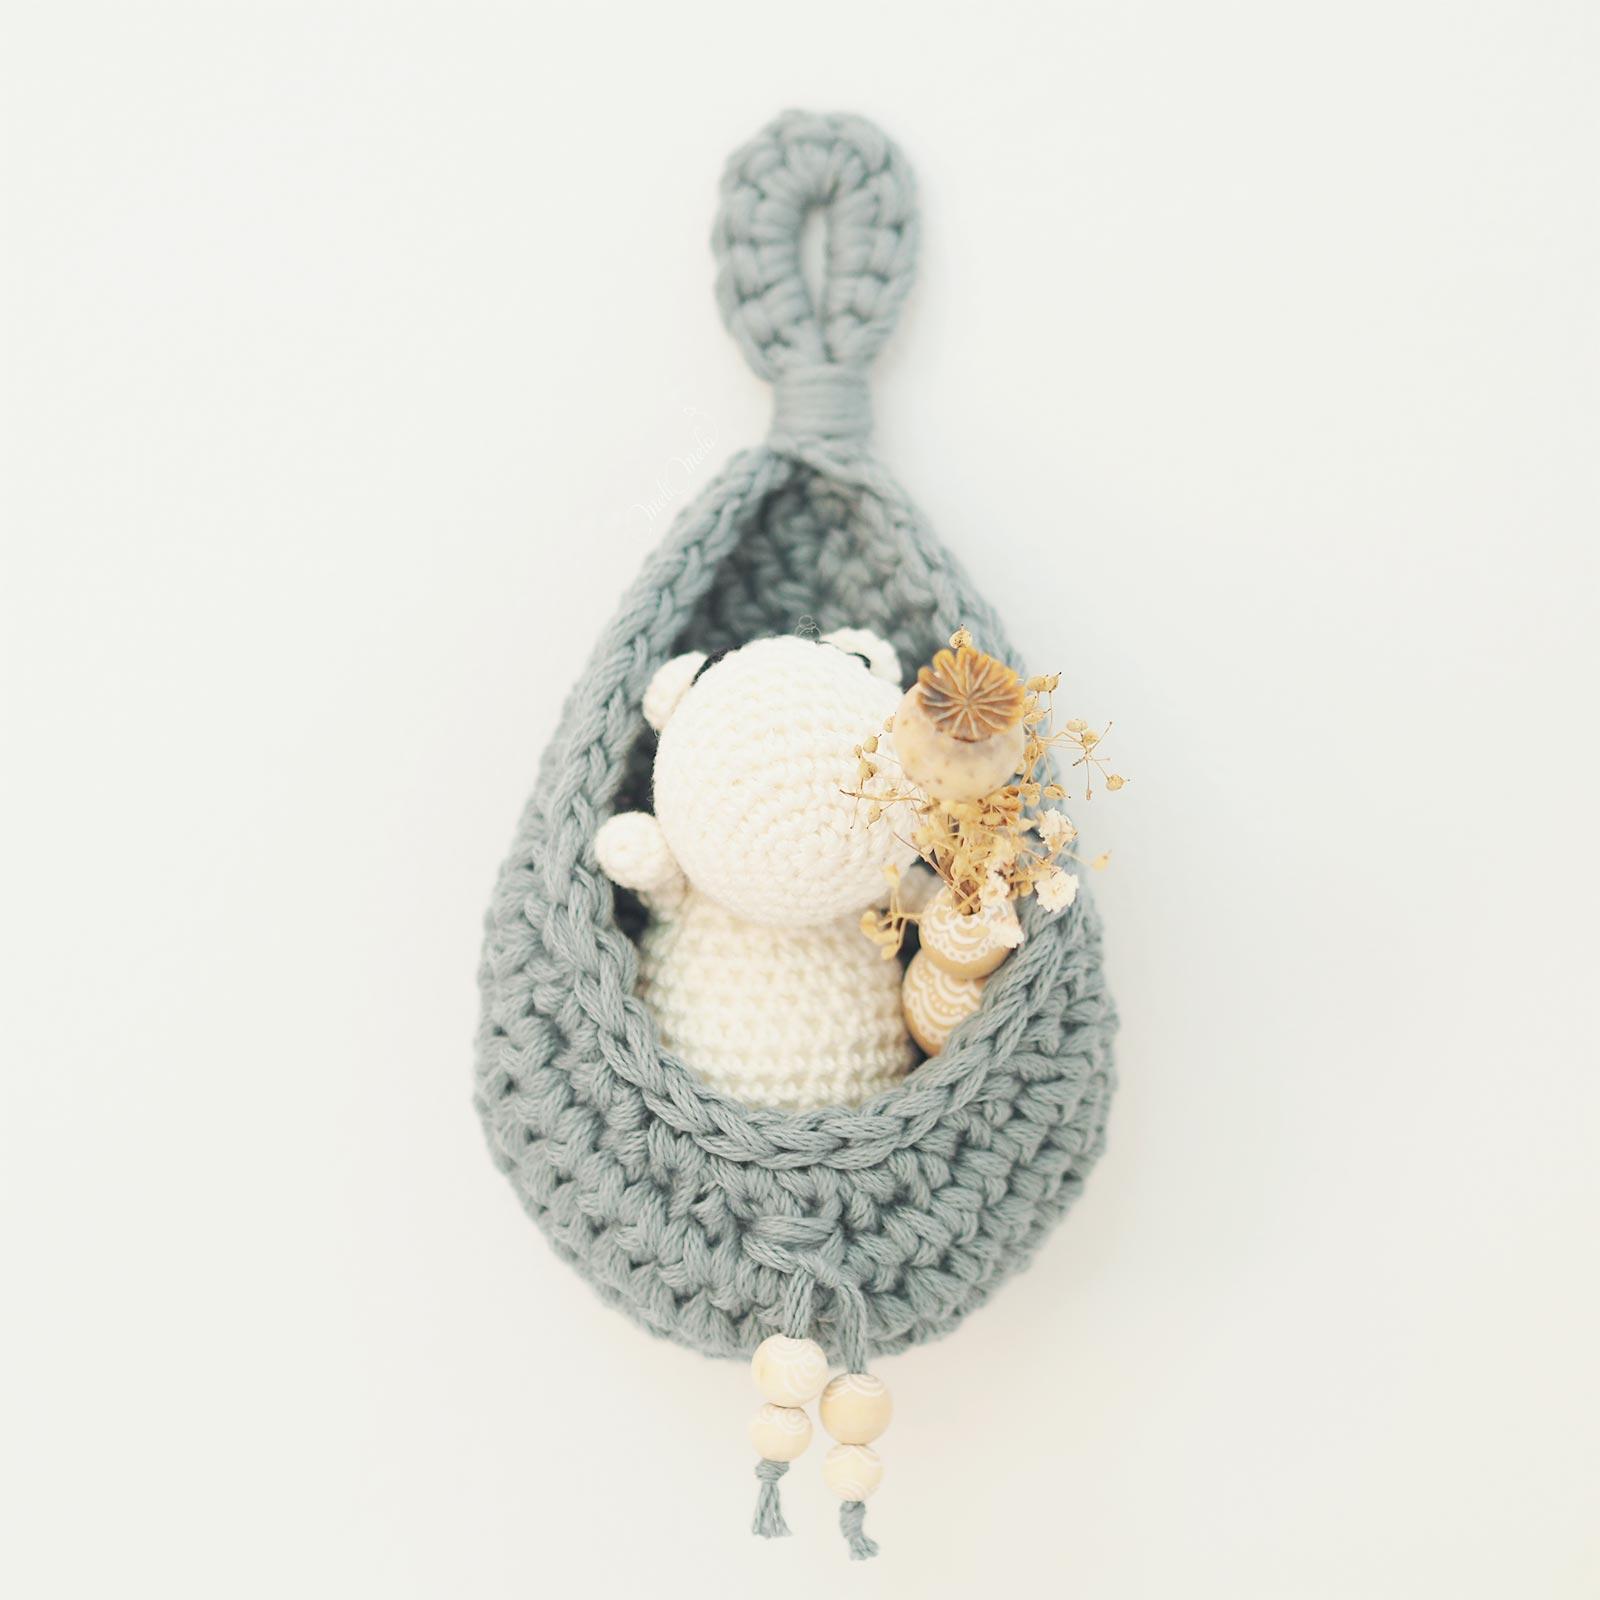 panier-mural-crochet-coton-natura-xl-moomin-face-laboutiquedemelimelo